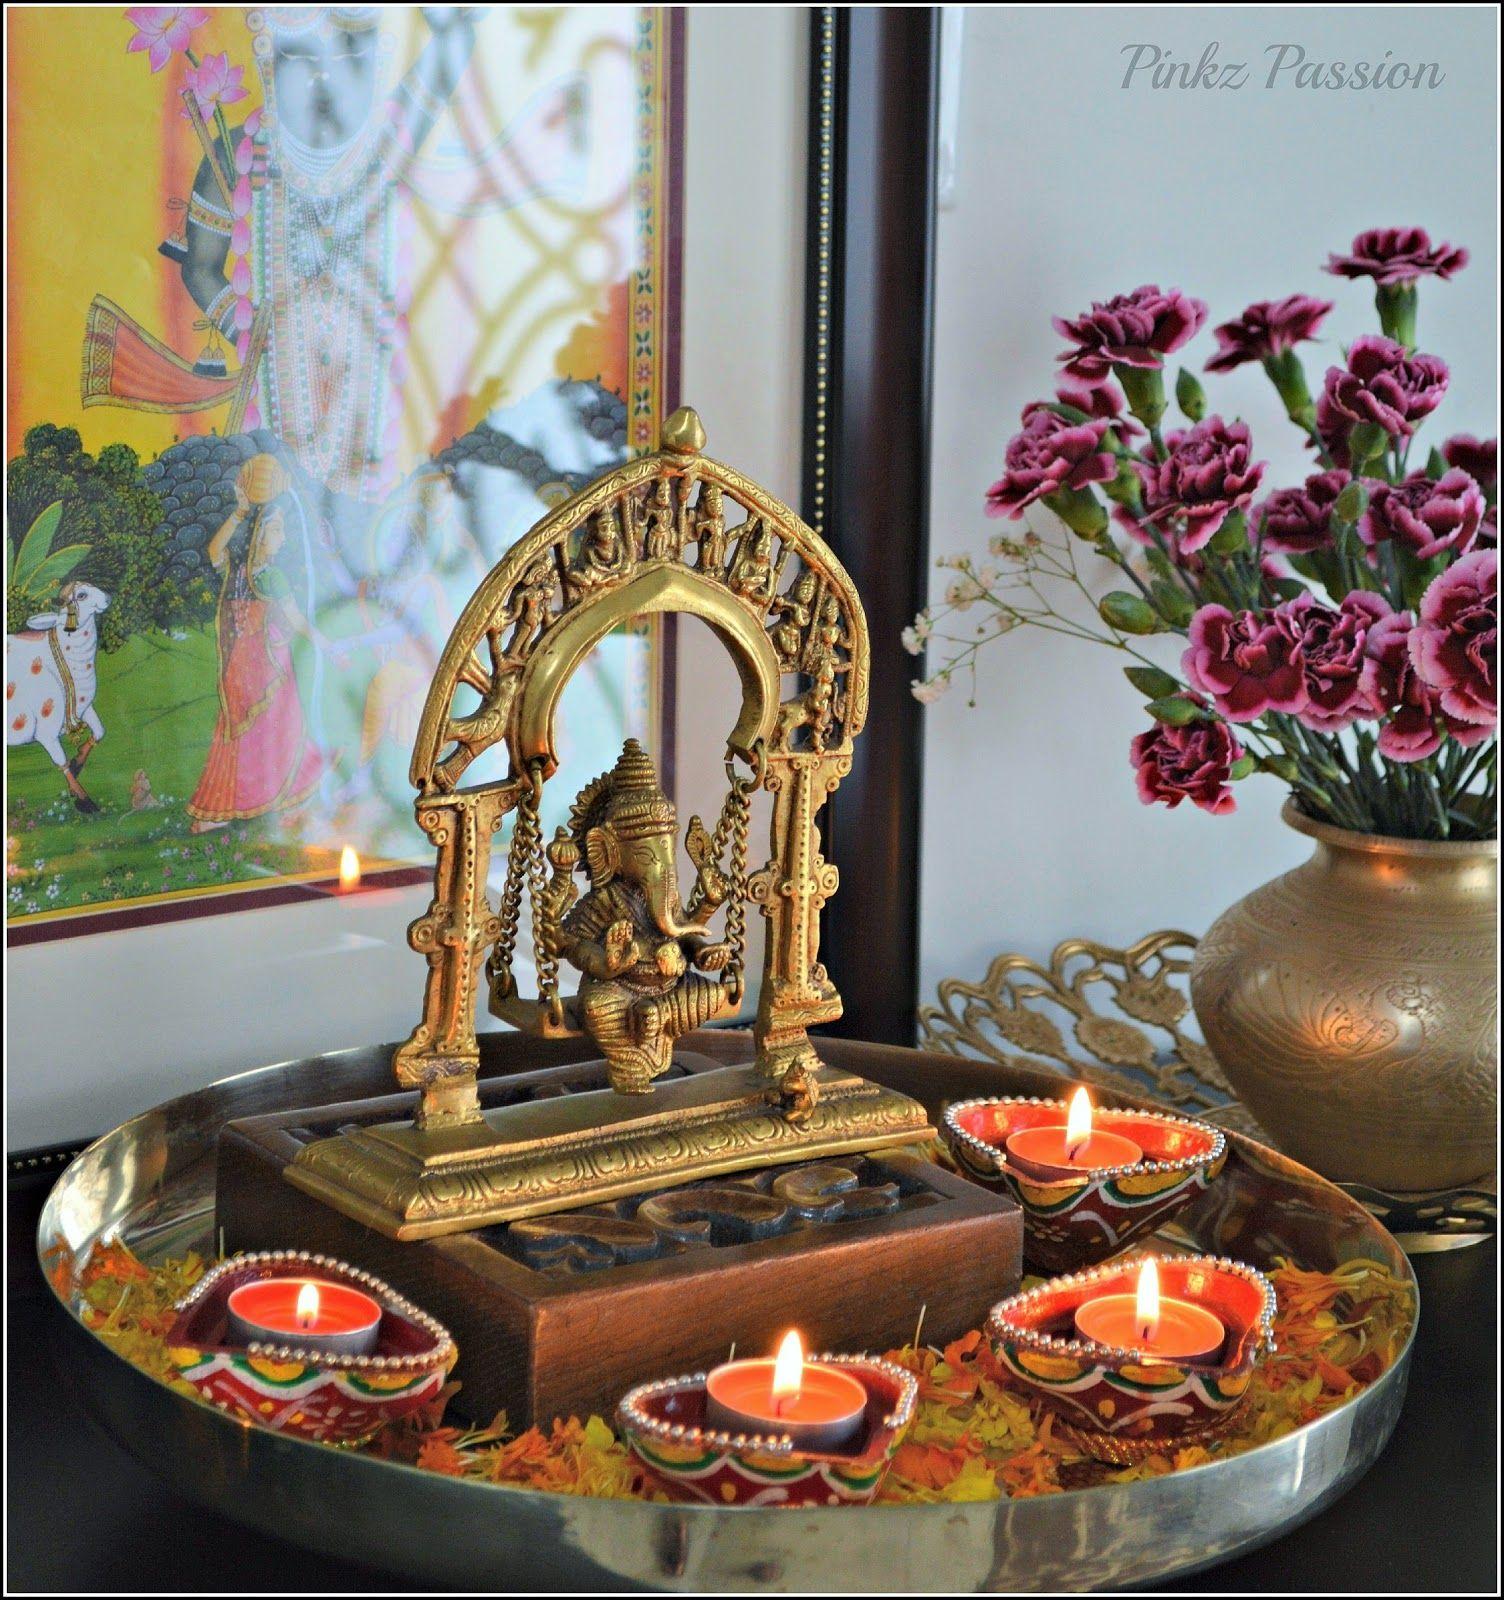 Diwali Home Decoration Lights: Pinkz Passion : Festival Of Lights